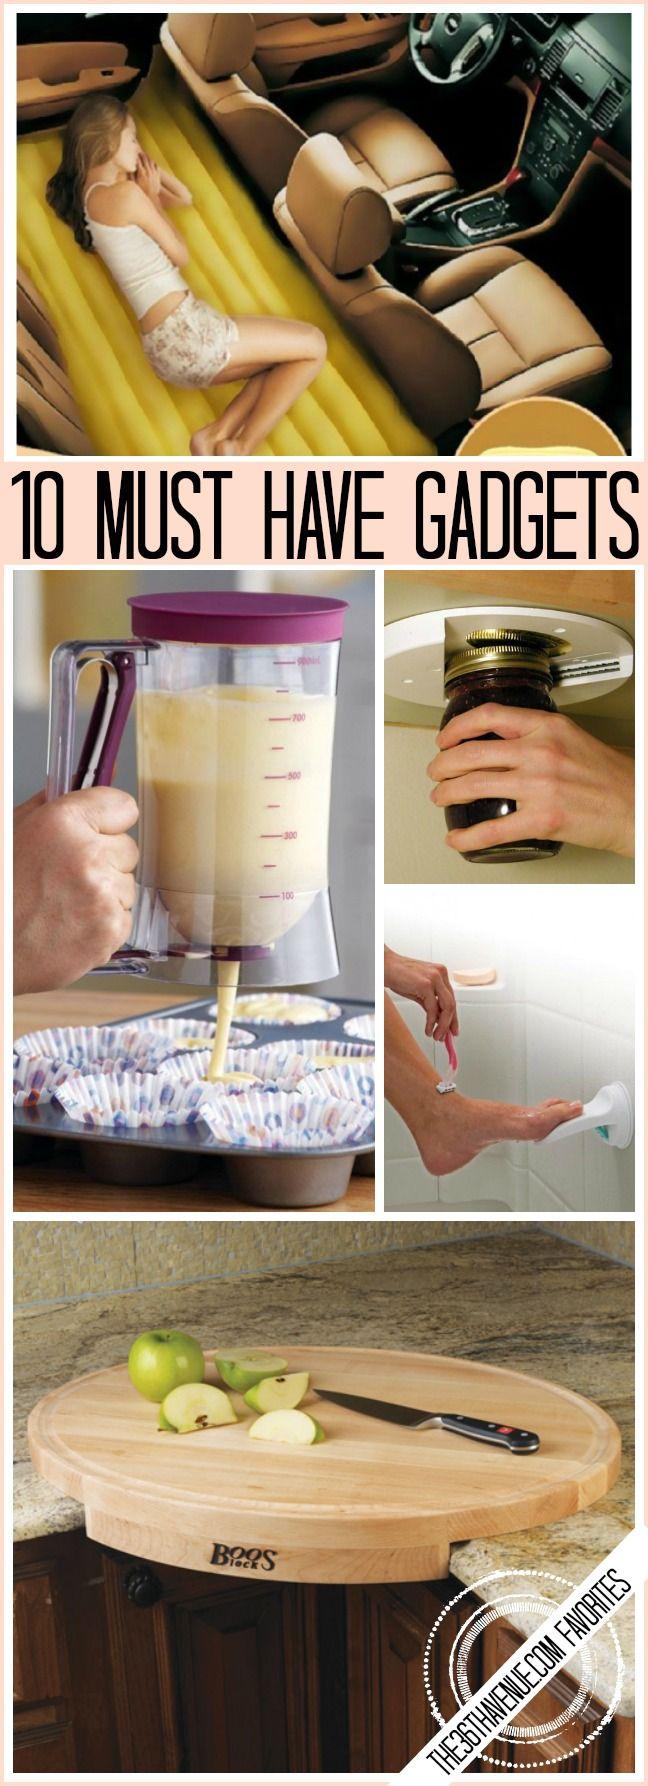 10 Clever Gadgets Everyone Should Have Calutile Gadget Cuisine Trucs Et Astuces Et Idee Home Staging